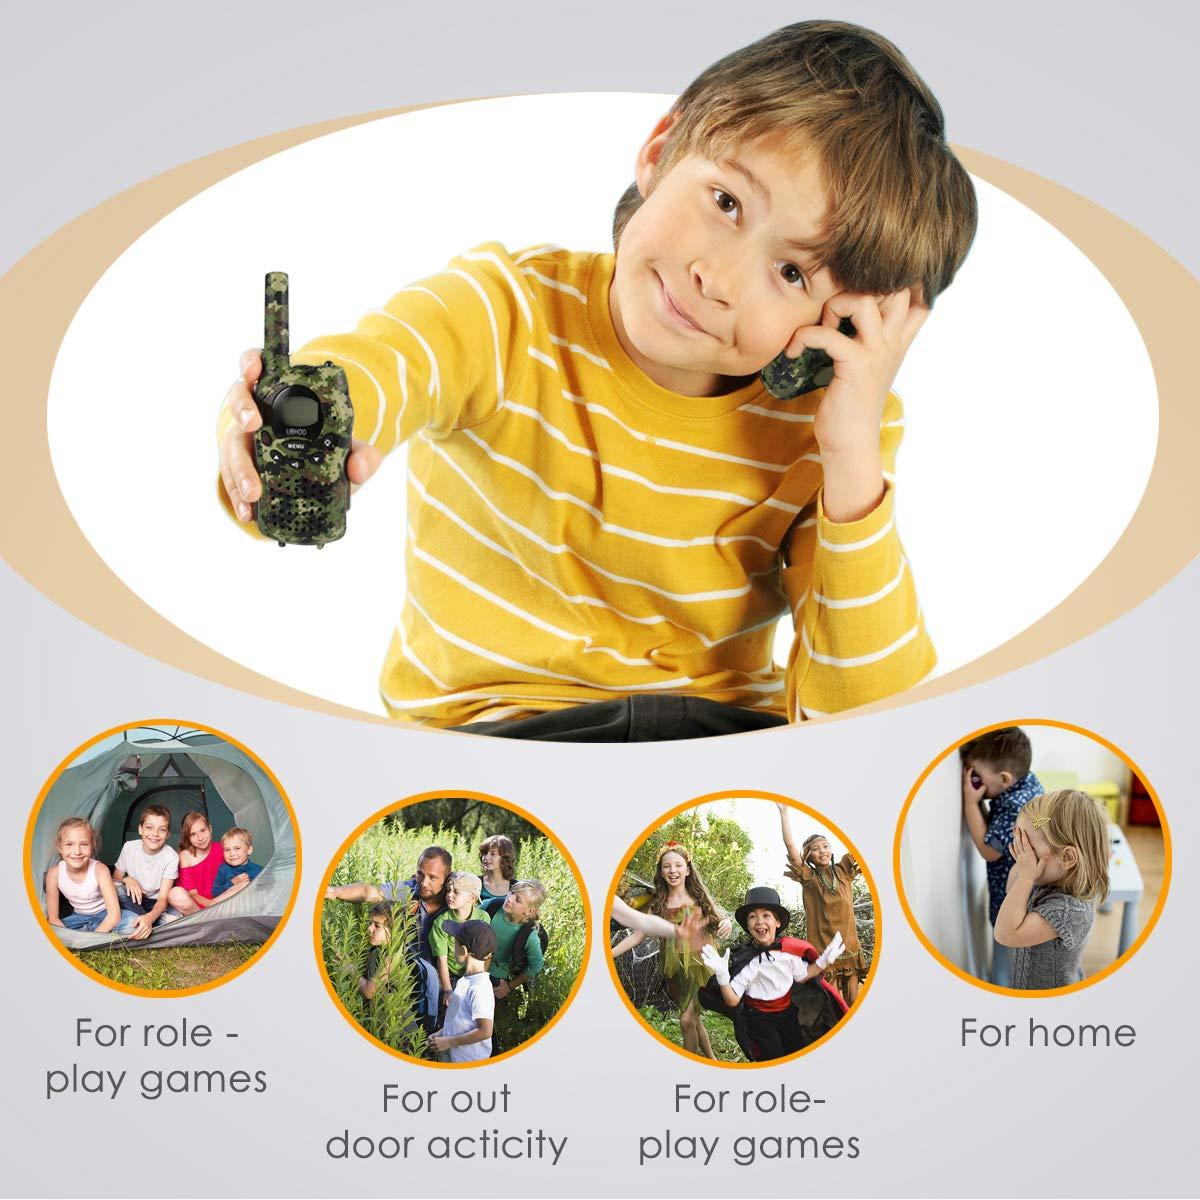 Kids Walkie Talkies, UOKOO Walkie Talkies for Kids 22 Channel FRS/GMRS Two Way Radio Up to 3KM UHF Handheld Walkie Talkies, Toys for 5-year old Boys, Gifts for 7-year Old Boys and Girls by UOKOO (Image #6)